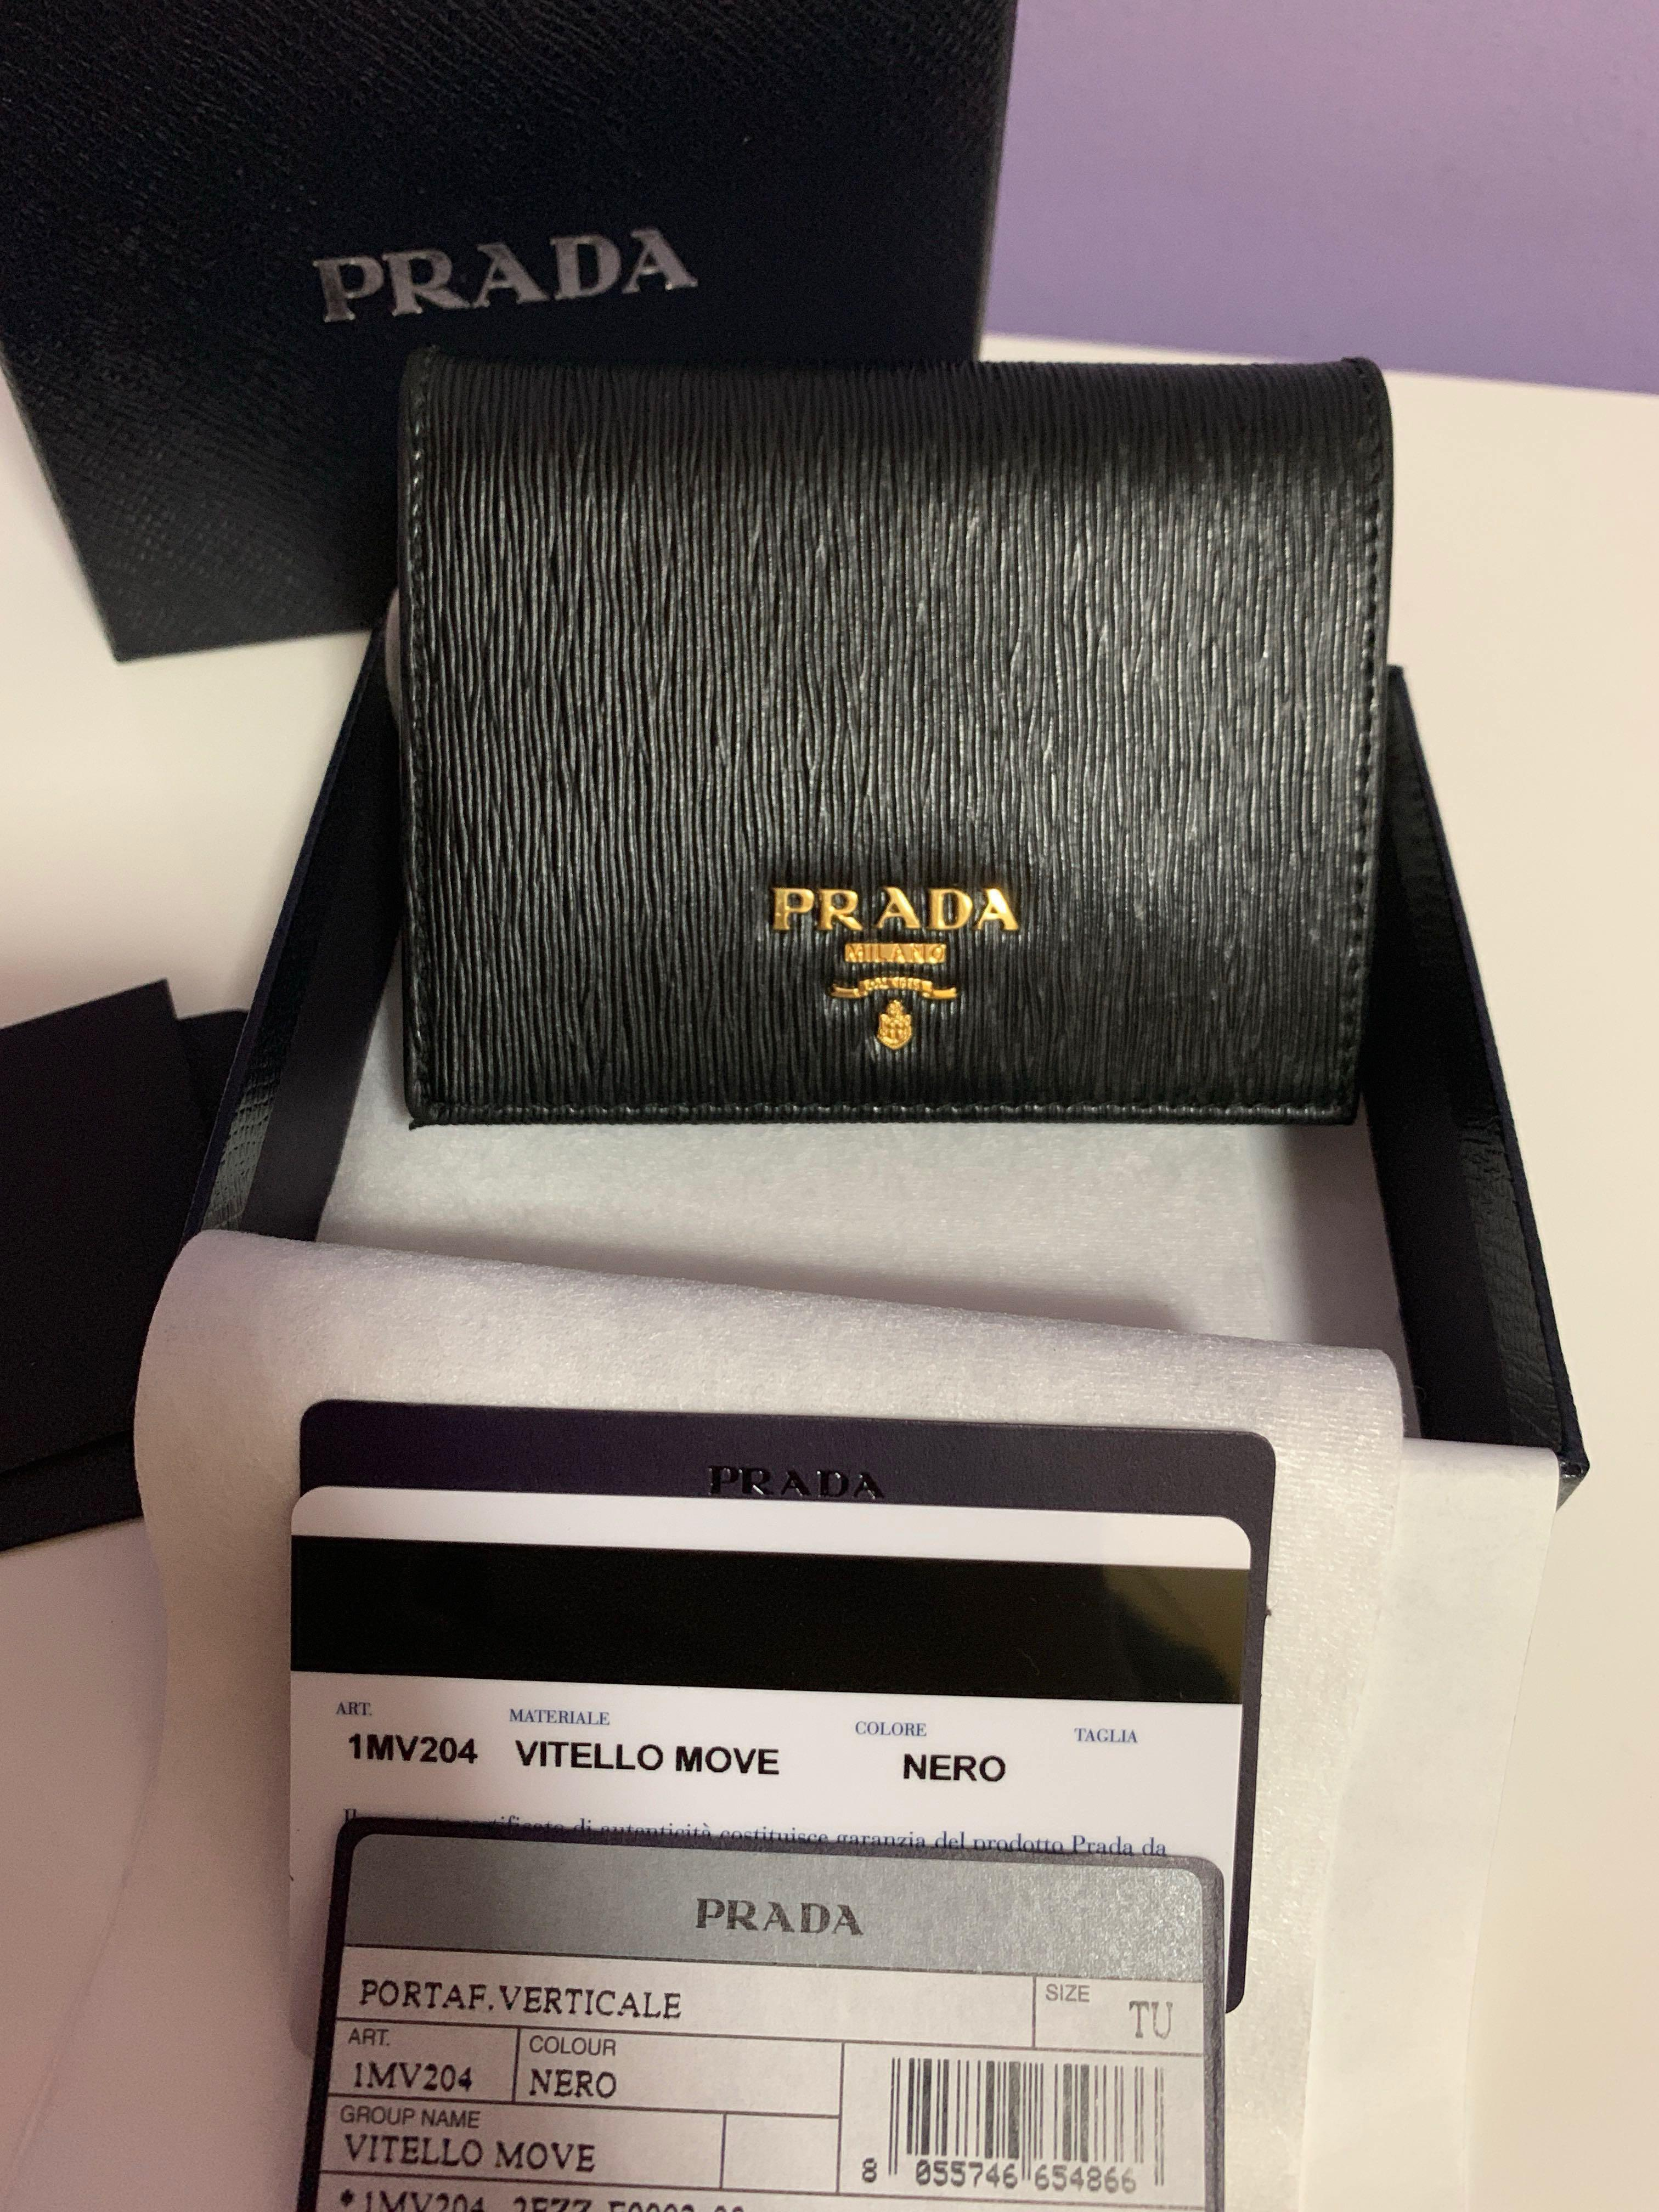 2d81cce7 Pending] Prada Saffiano Leather Short Bi-Fold Slim Wallet, Luxury ...